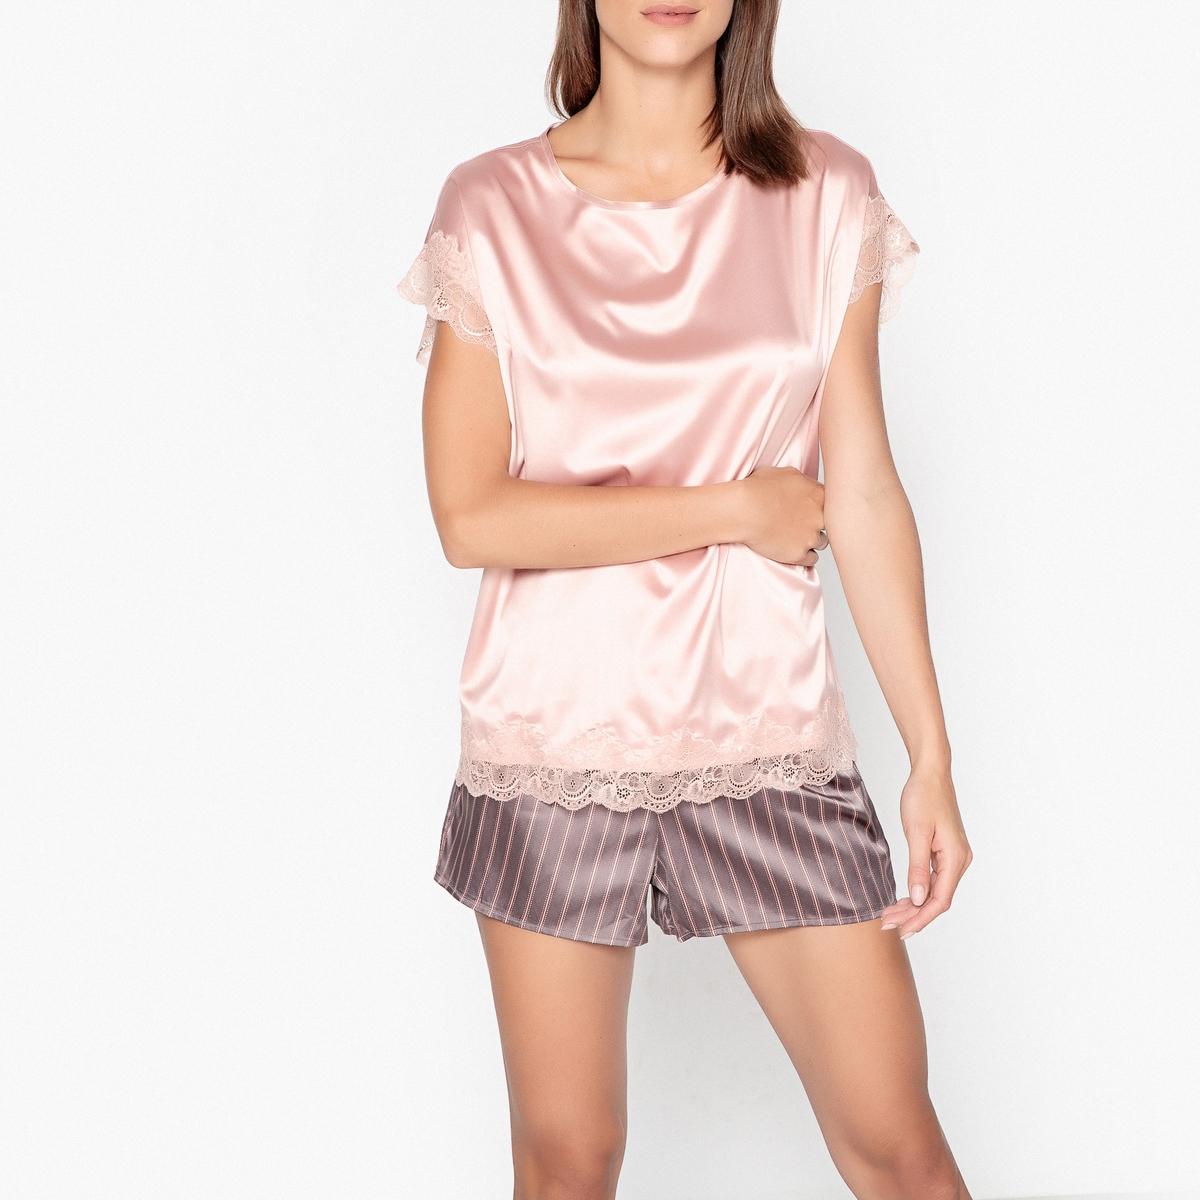 Pijama em cetim, detalhe em renda